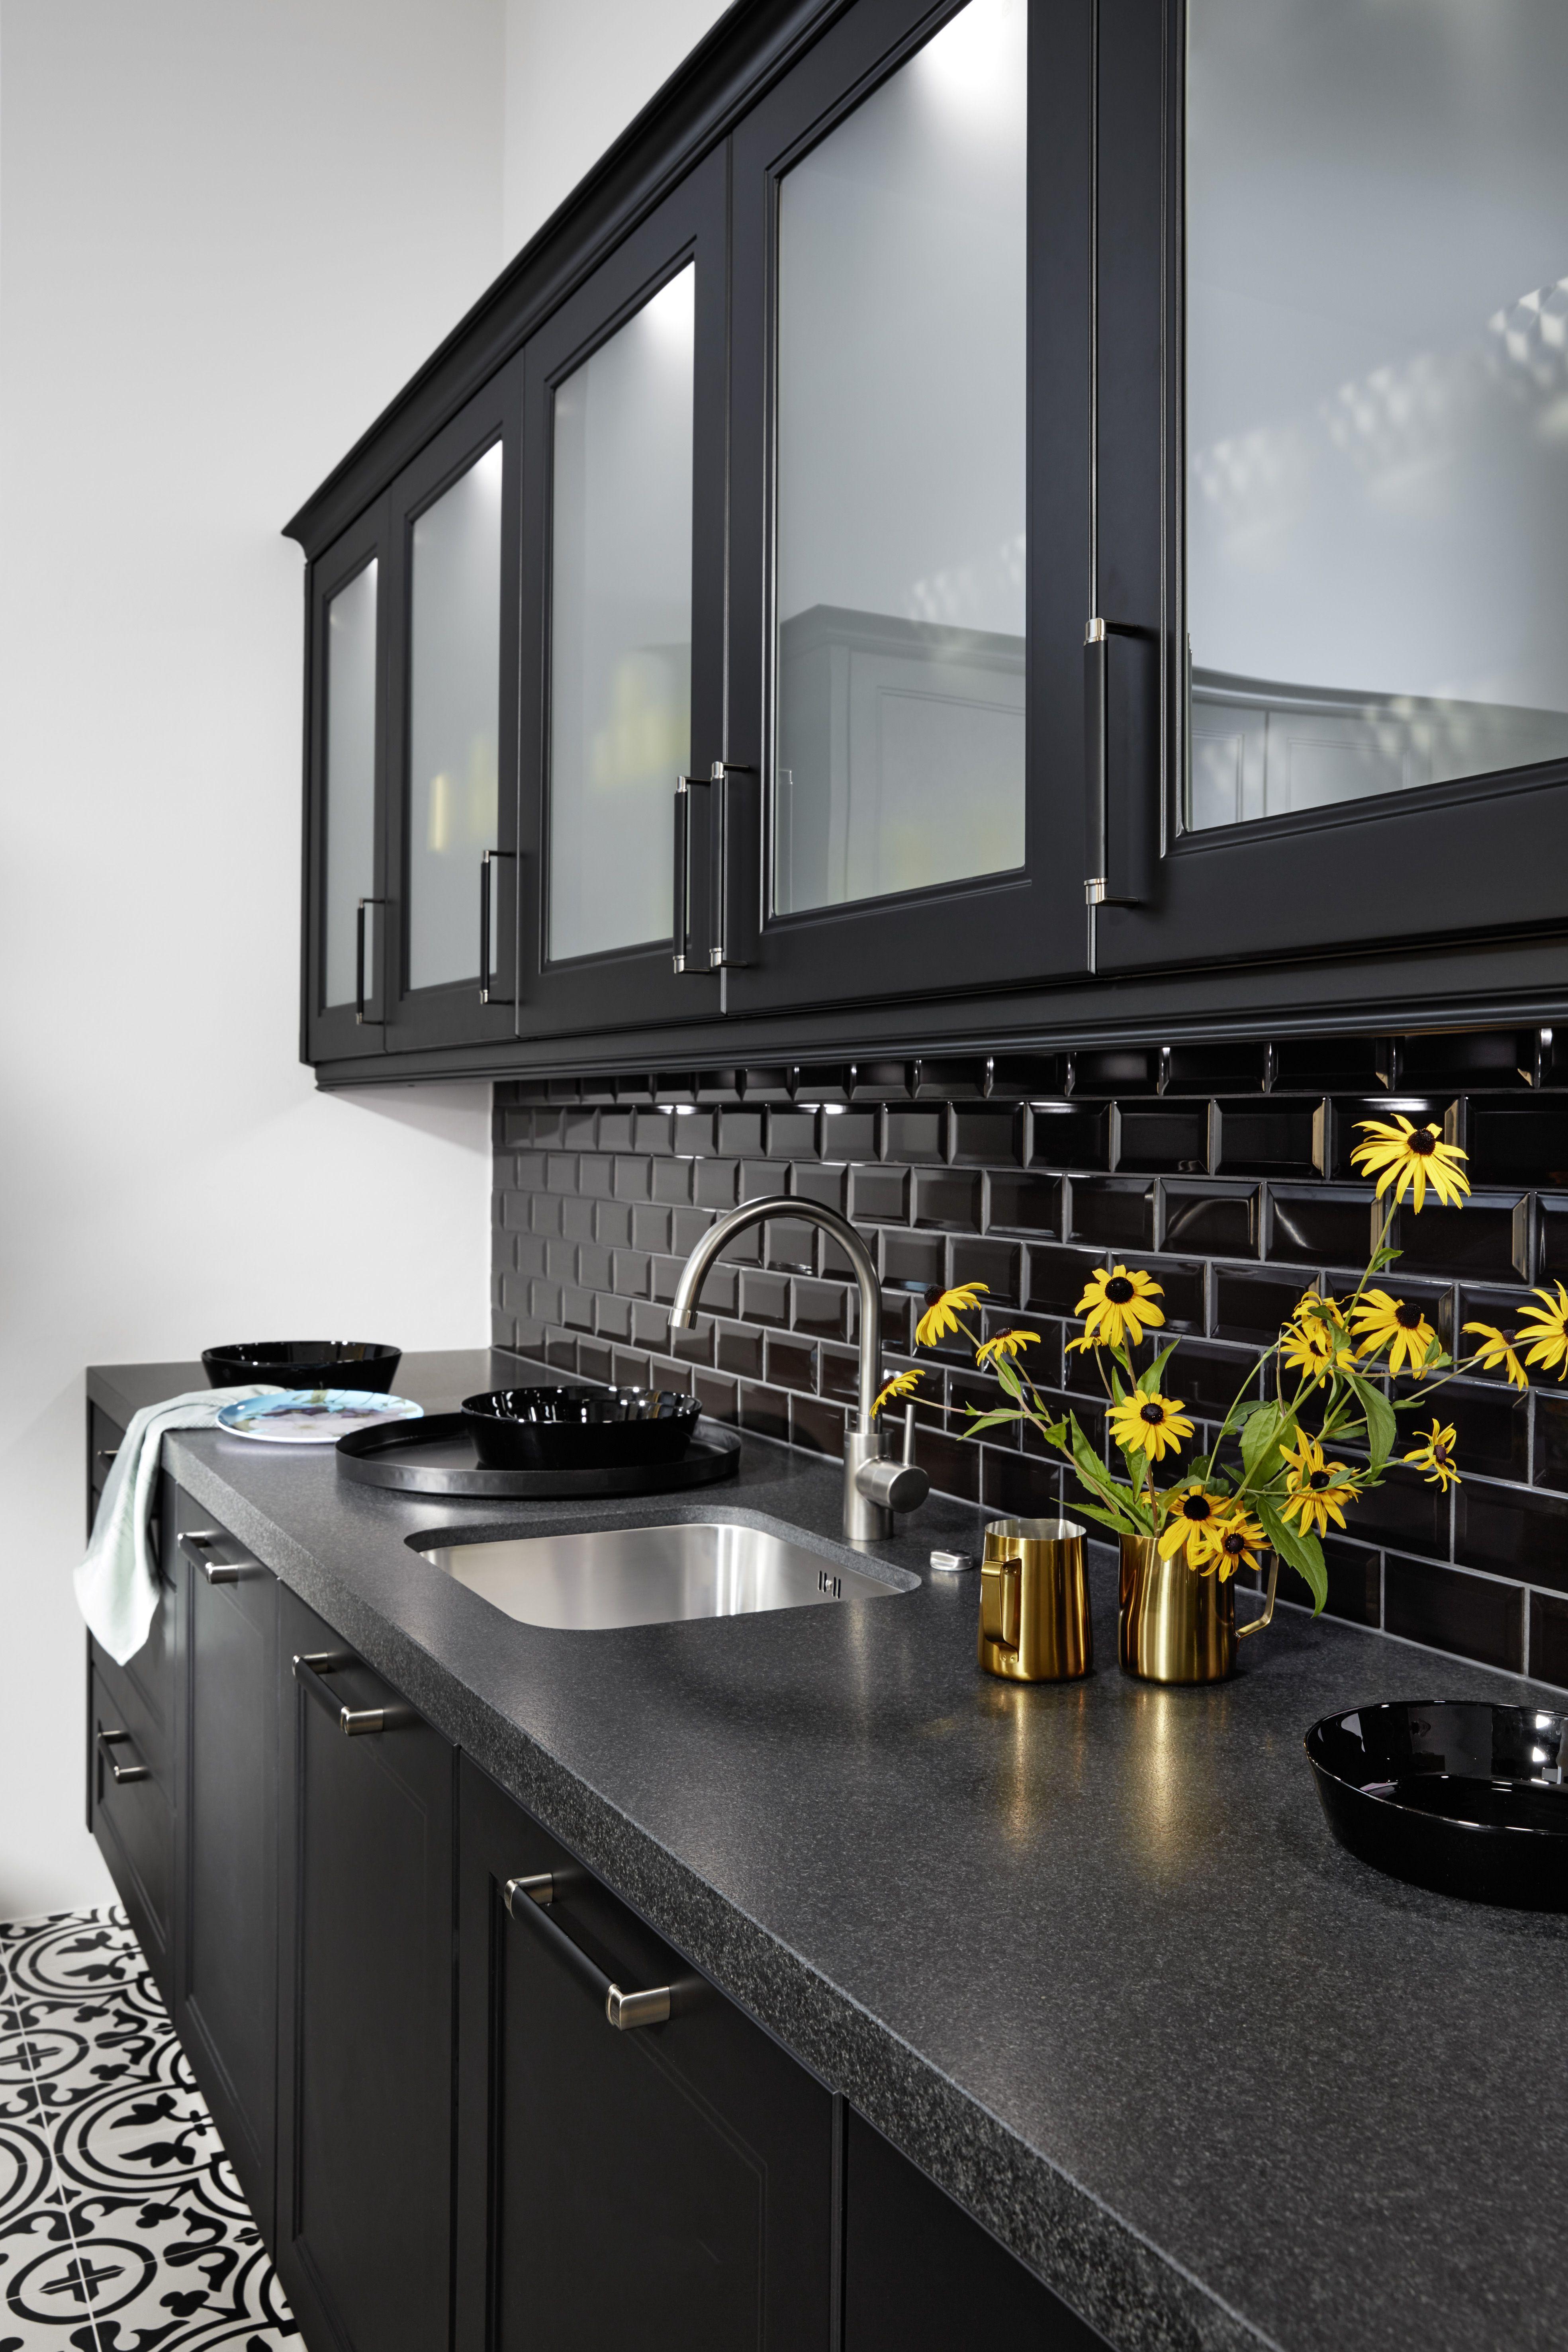 Country kitchen interpreted in a contemporary manner nolte kuechen de